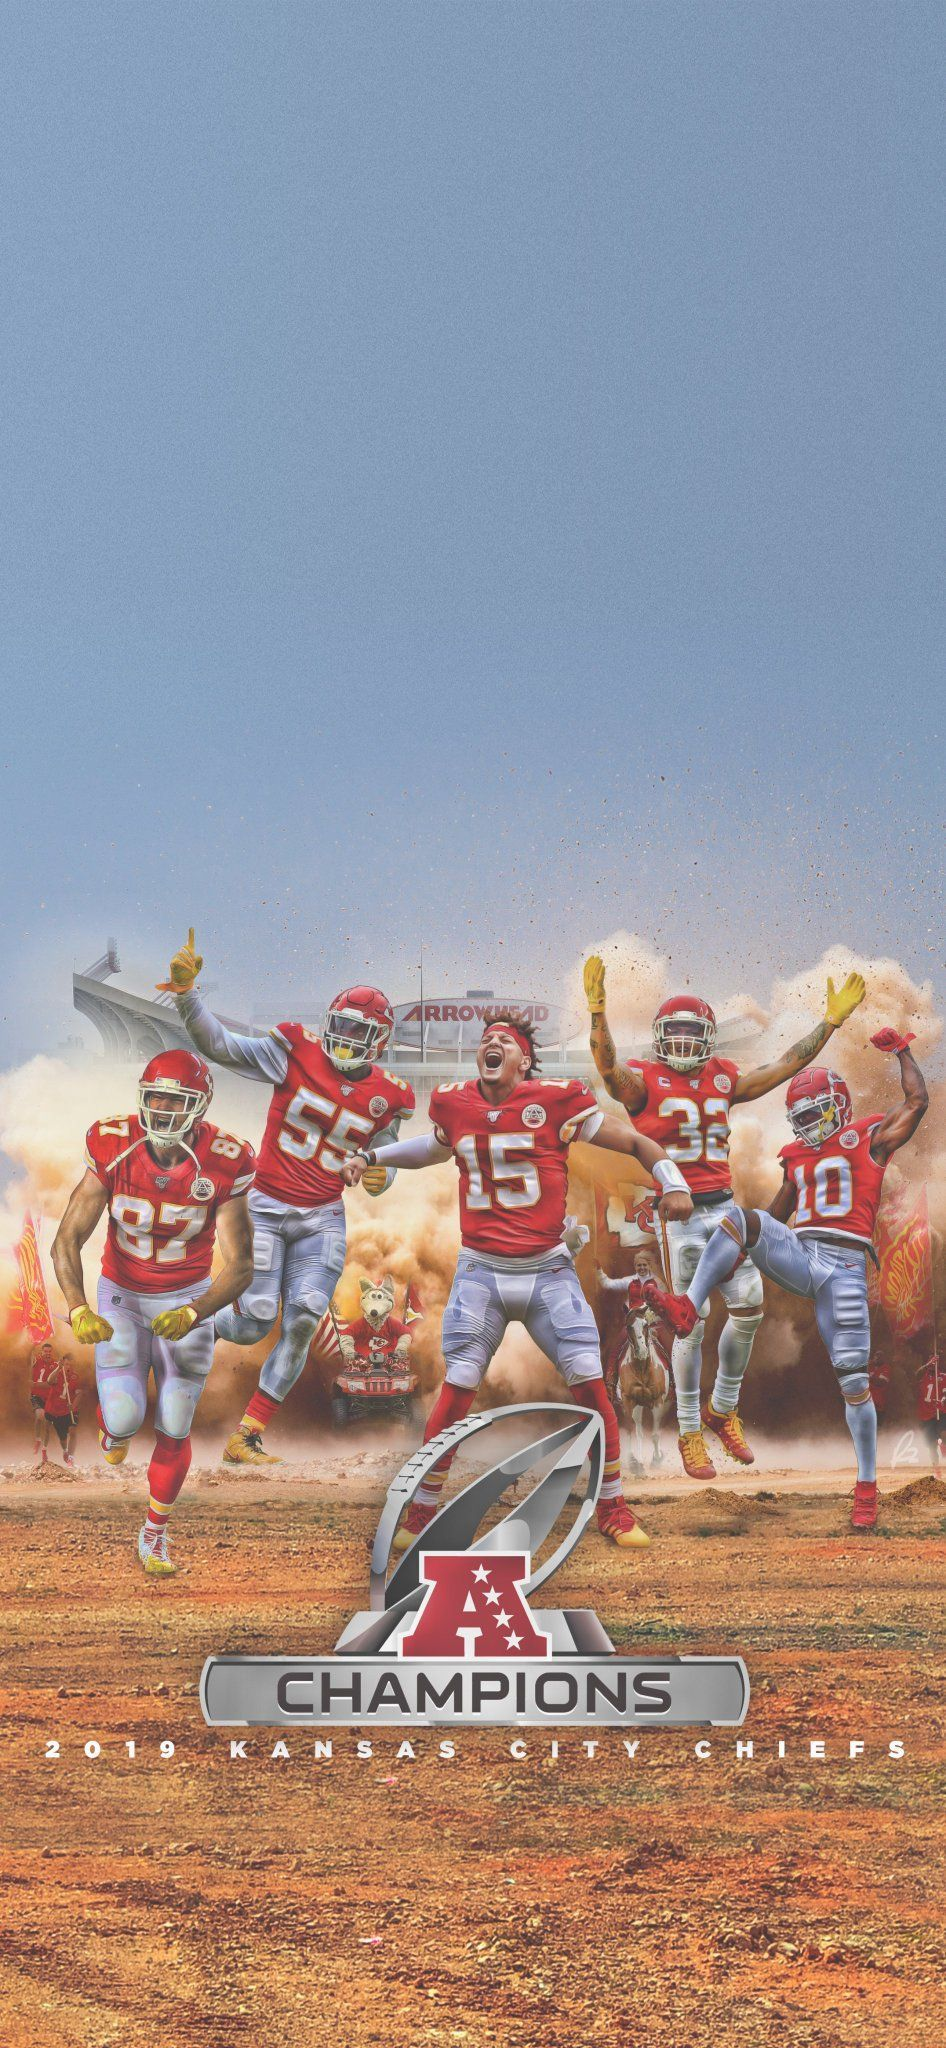 Chiefs 4 Life By Jayden Alexis 234534 Designhill In 2020 Kansas City Chiefs Logo Kansas City Chiefs Kc Chiefs Football